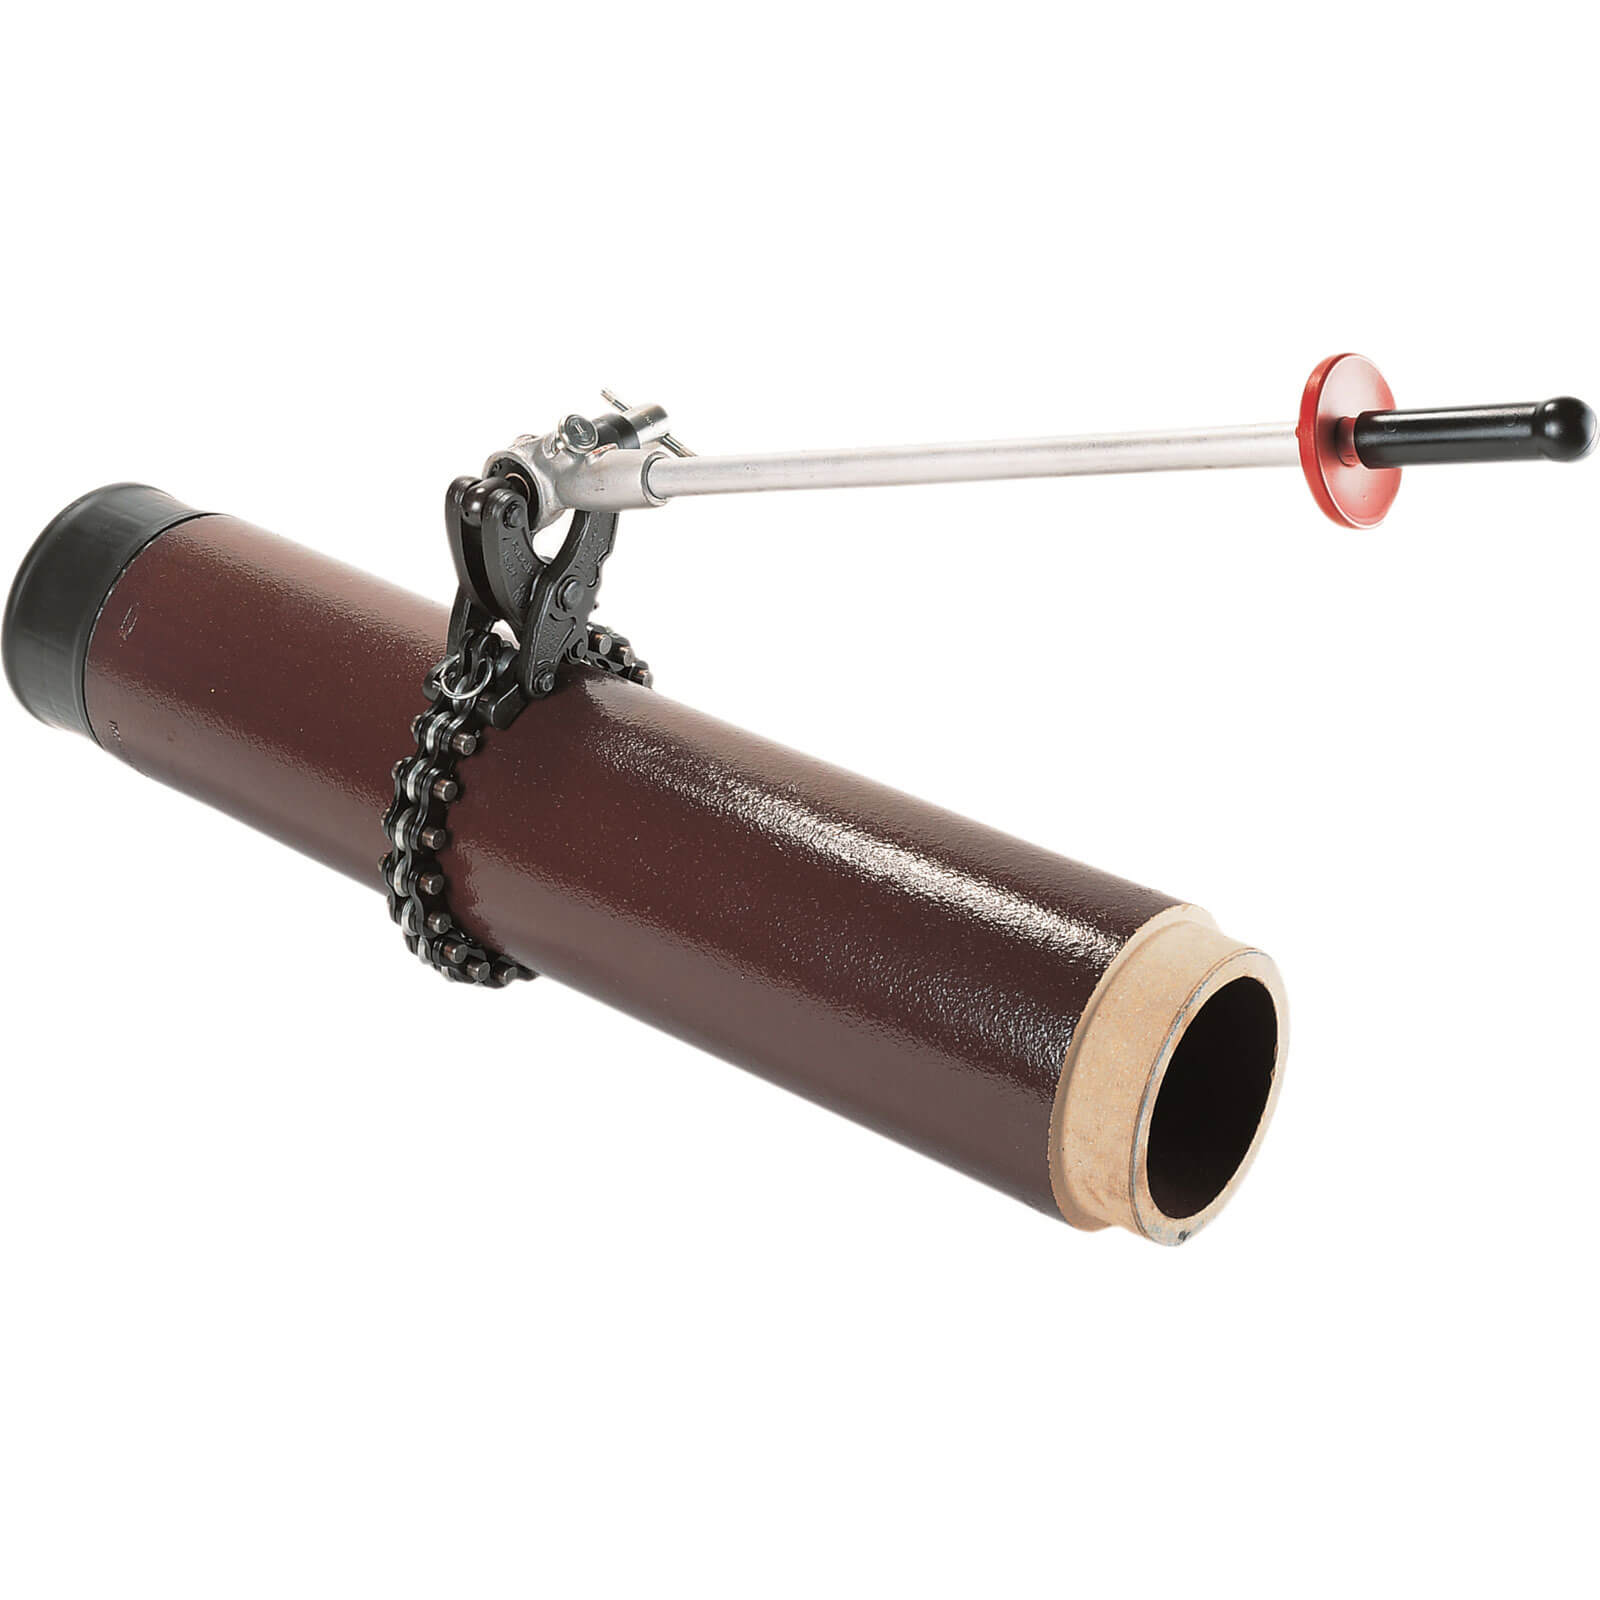 Ridgid Ratcheting Soil Pipe Cutter